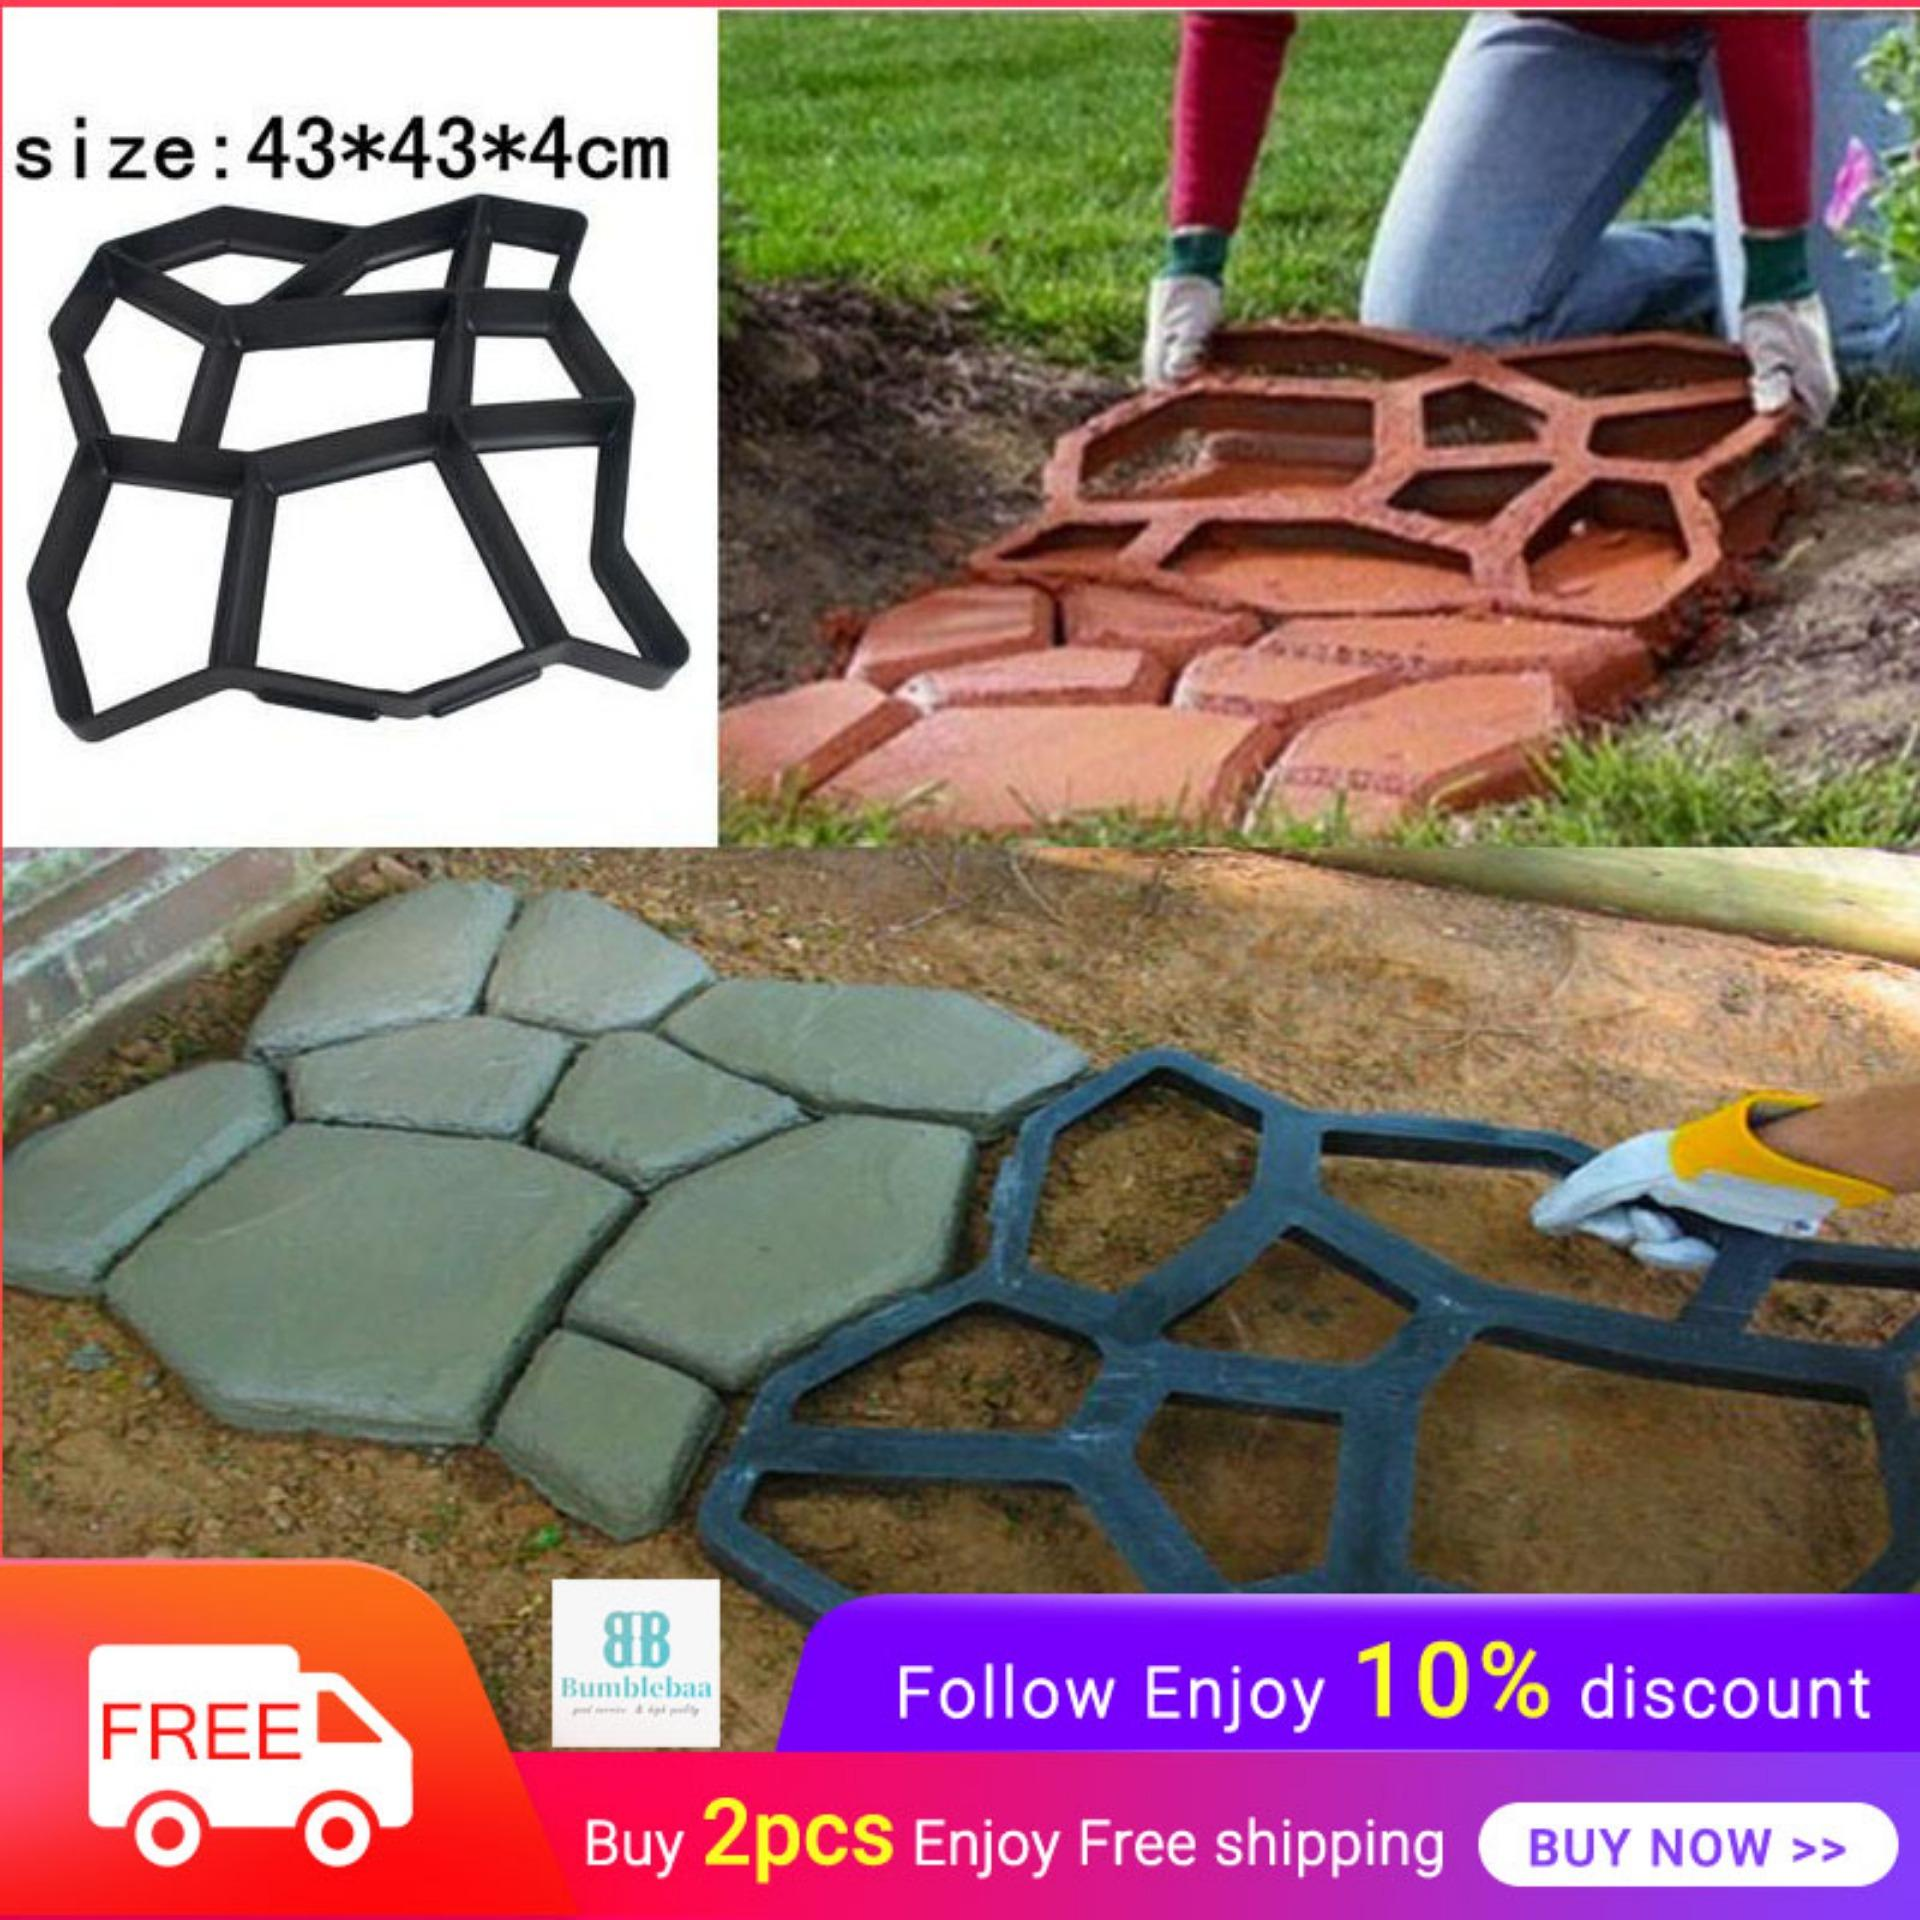 Bumblebaa Walk Maker Reusable Concrete Path Maker Molds Stepping Stone  Paver Lawn Patio Yard Garden DIY Walkway Pavement Paving Moulds (Irregular)